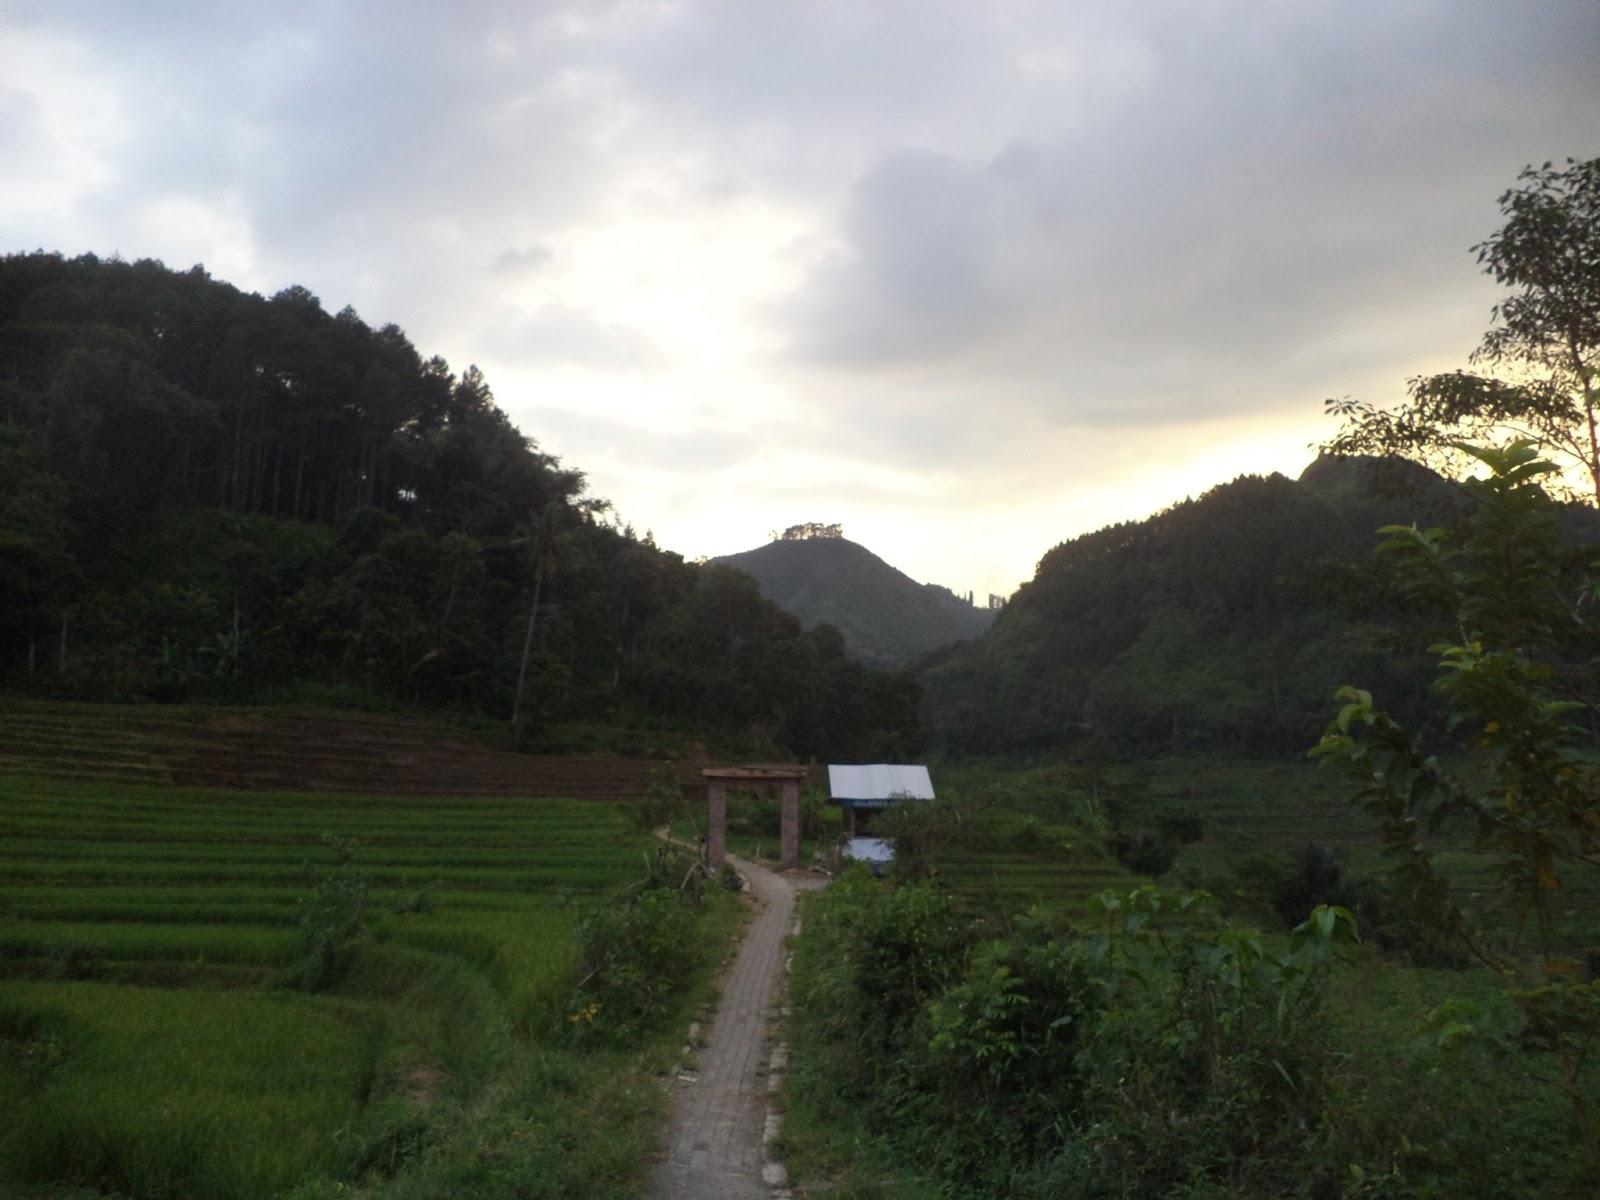 Wisata Candi Selogriyo Magelang Gunung Sondong Keren Alam Mencoba Berwisata